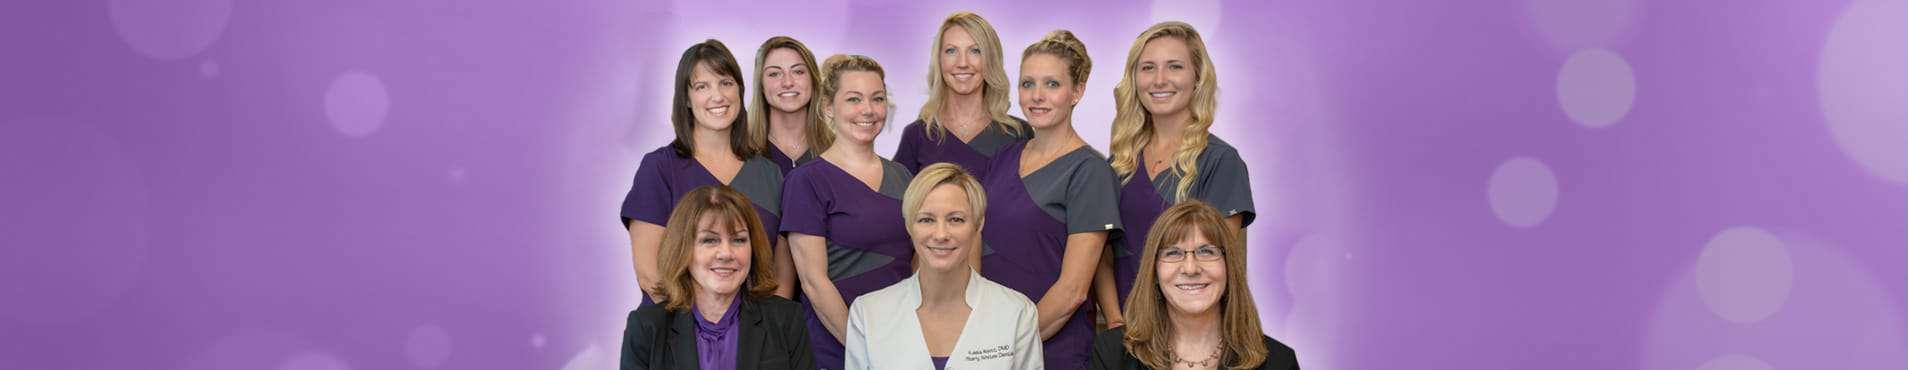 Dental Crowns Dentist Serving Twin Rivers